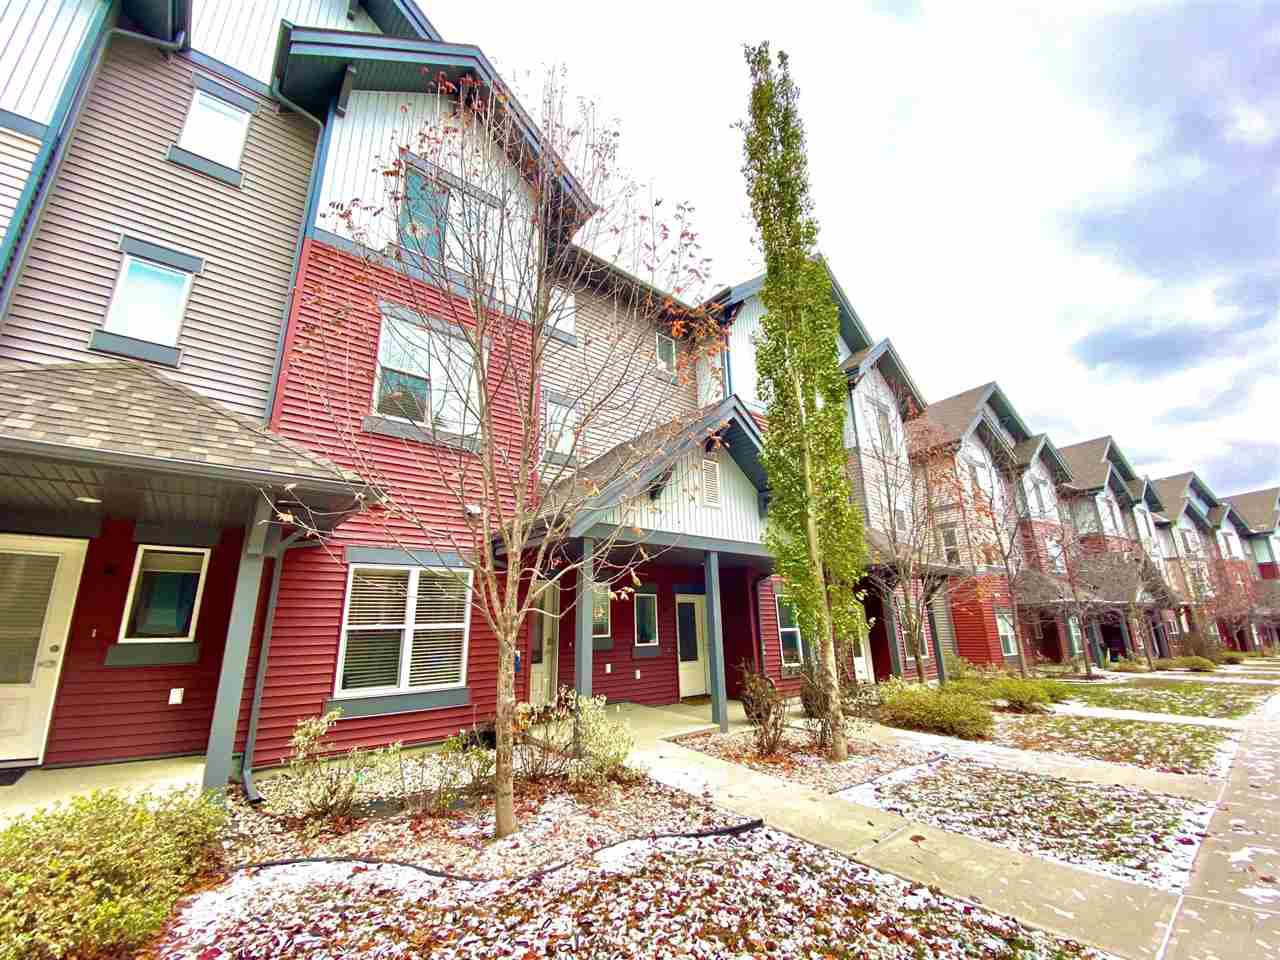 Main Photo: #35 655 WATT Boulevard in Edmonton: Zone 53 Townhouse for sale : MLS®# E4219164